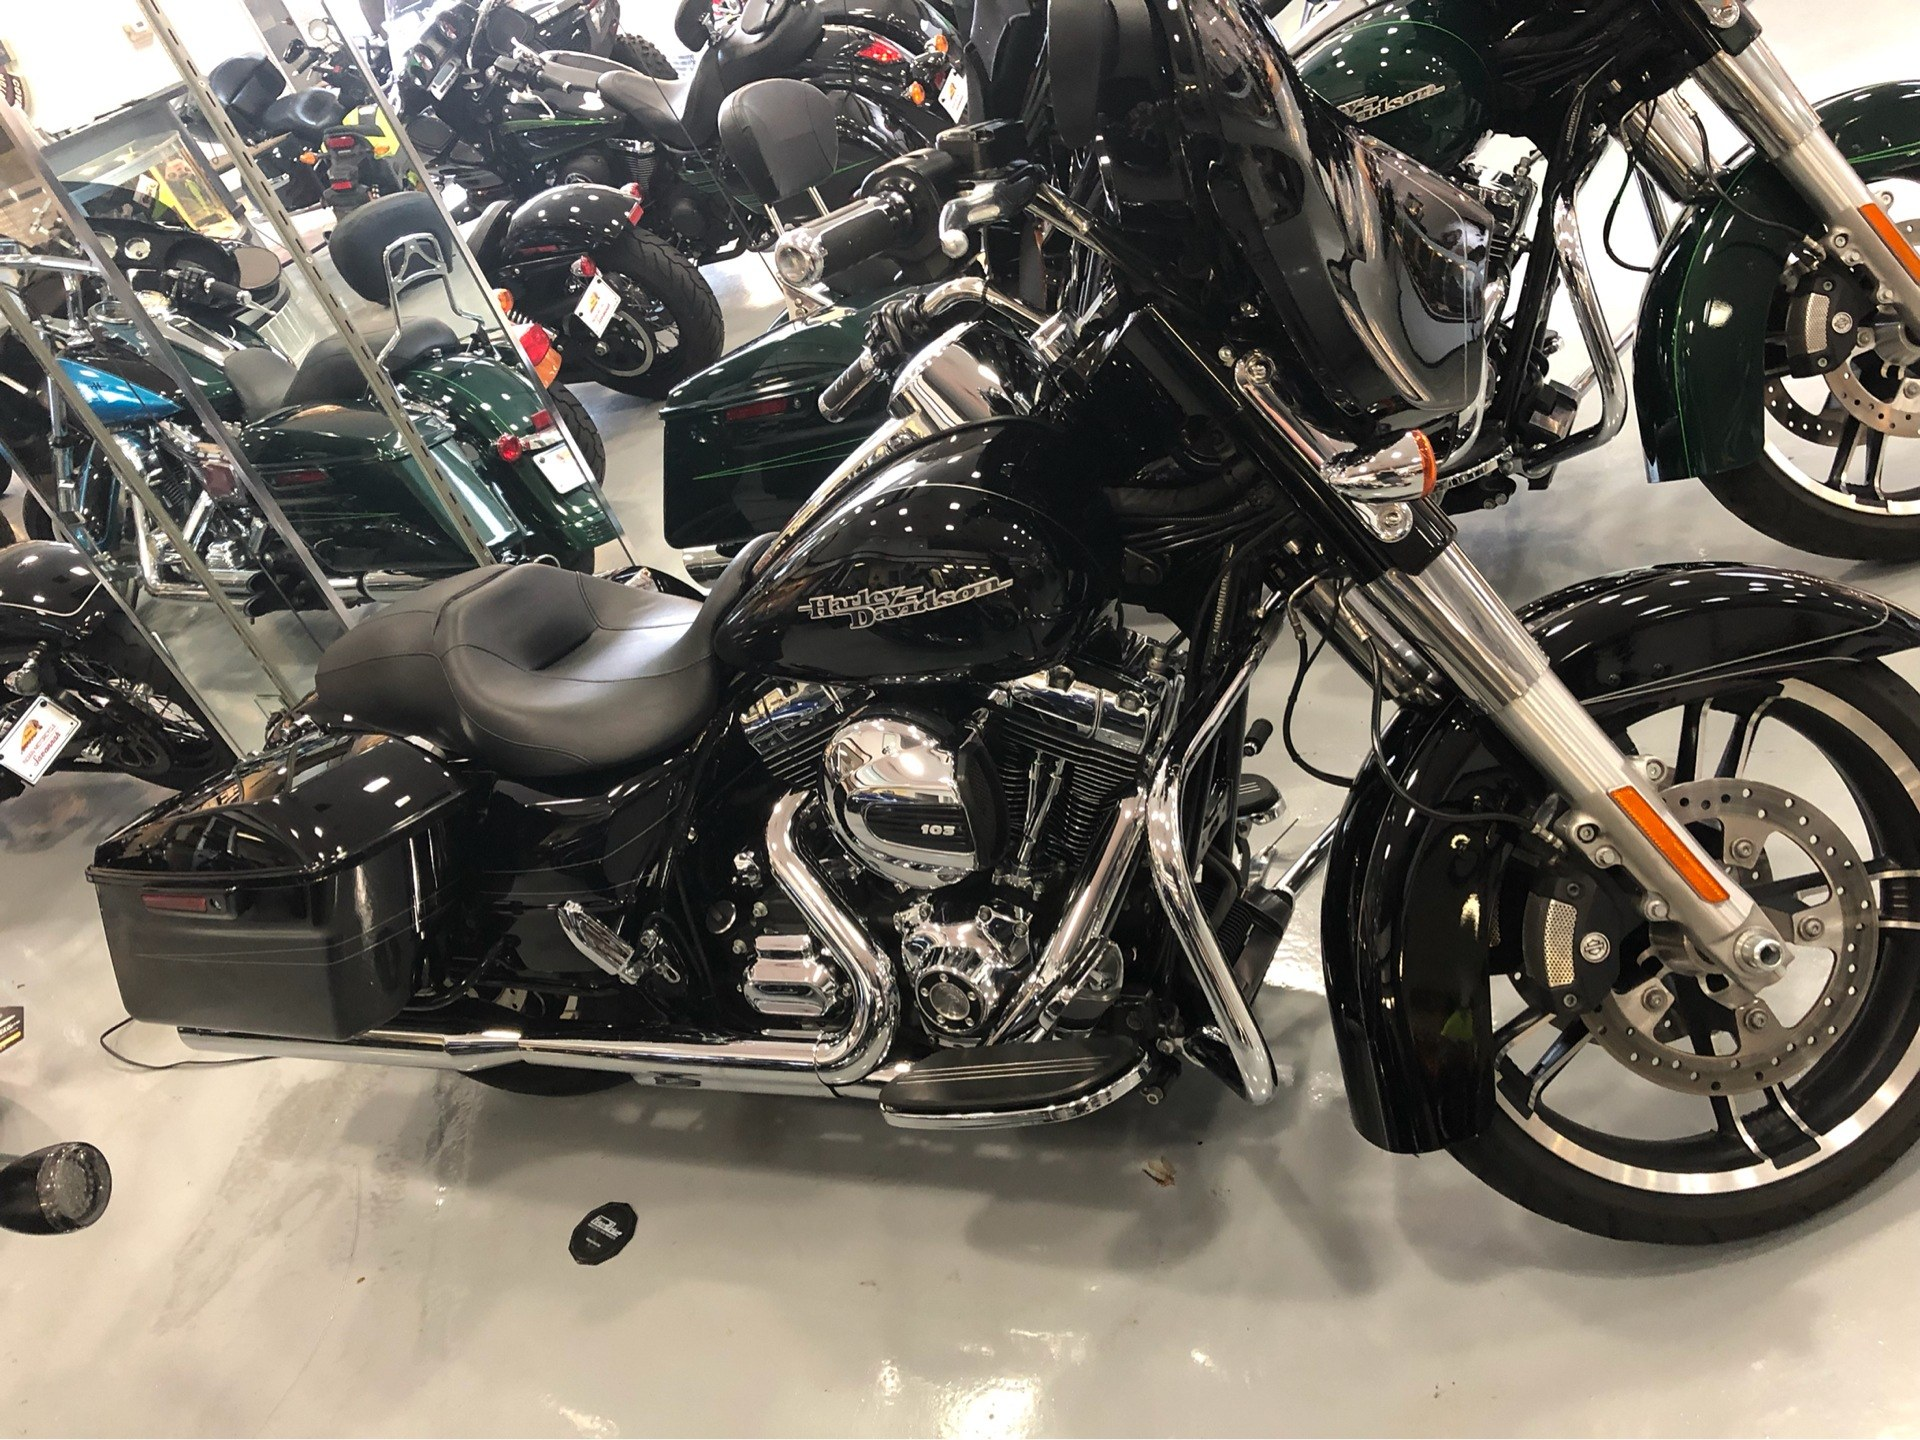 2016 Harley-Davidson Street Glide Special 3